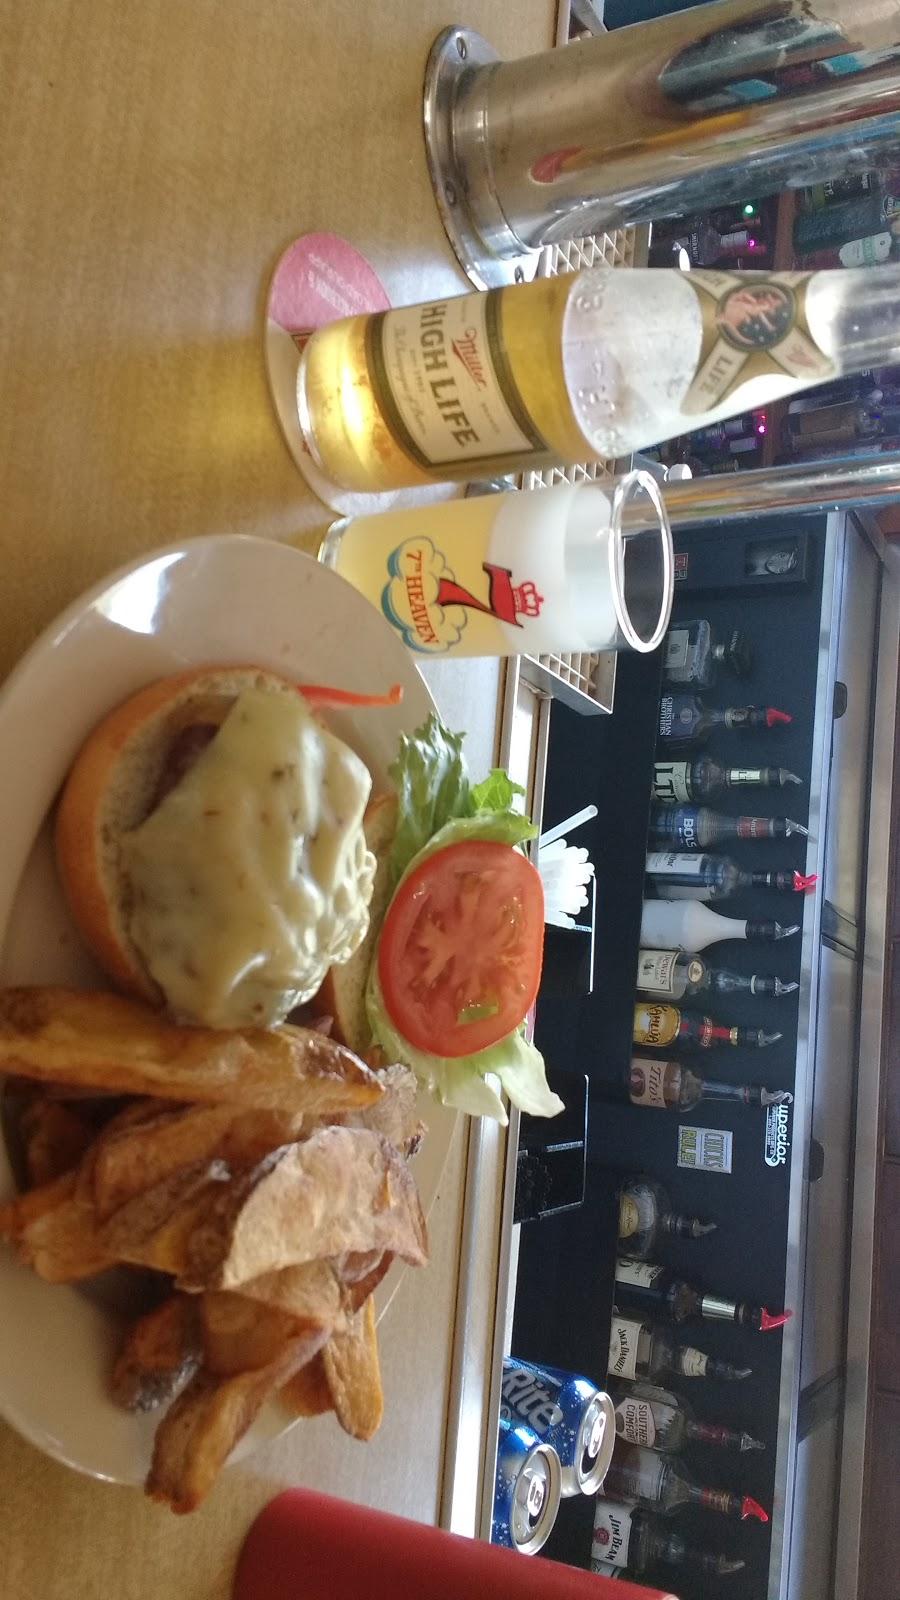 Bridgeport Inn - restaurant  | Photo 8 of 10 | Address: 42411 N Converse Rd, Antioch, IL 60002, USA | Phone: (847) 395-7840